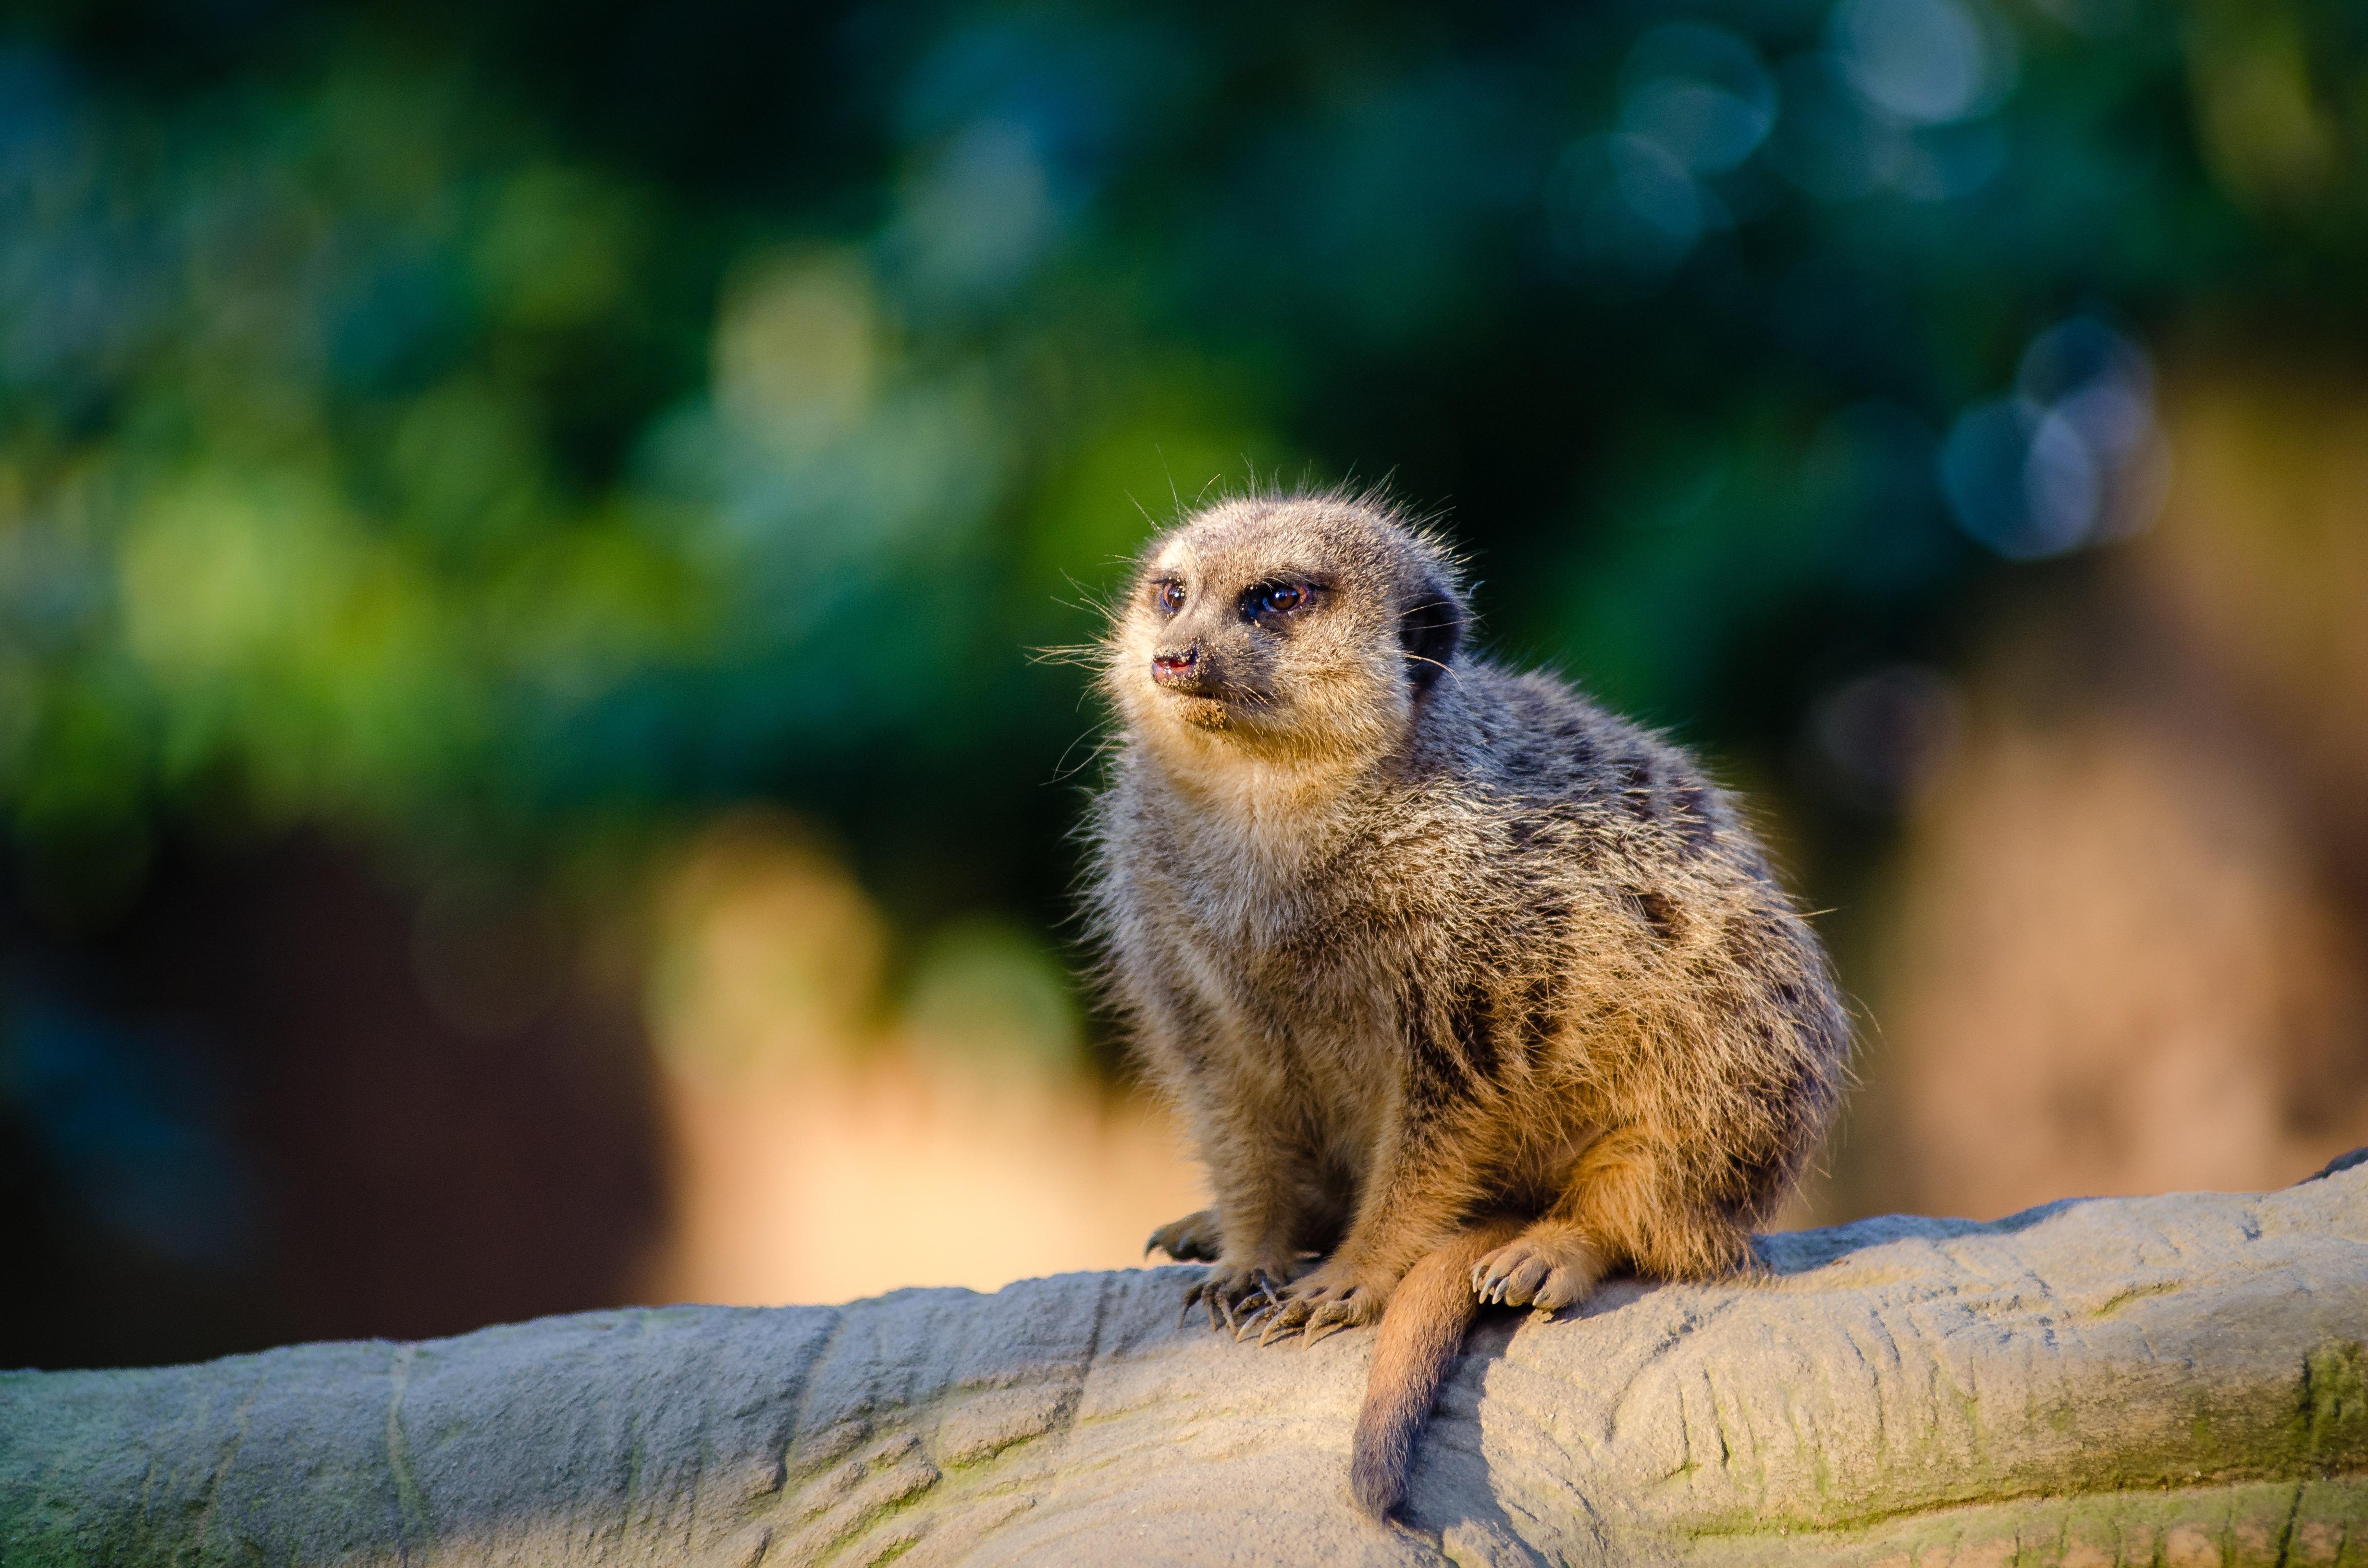 images gratuites paysage la nature faune afrique mammif re primate animal sauvage. Black Bedroom Furniture Sets. Home Design Ideas